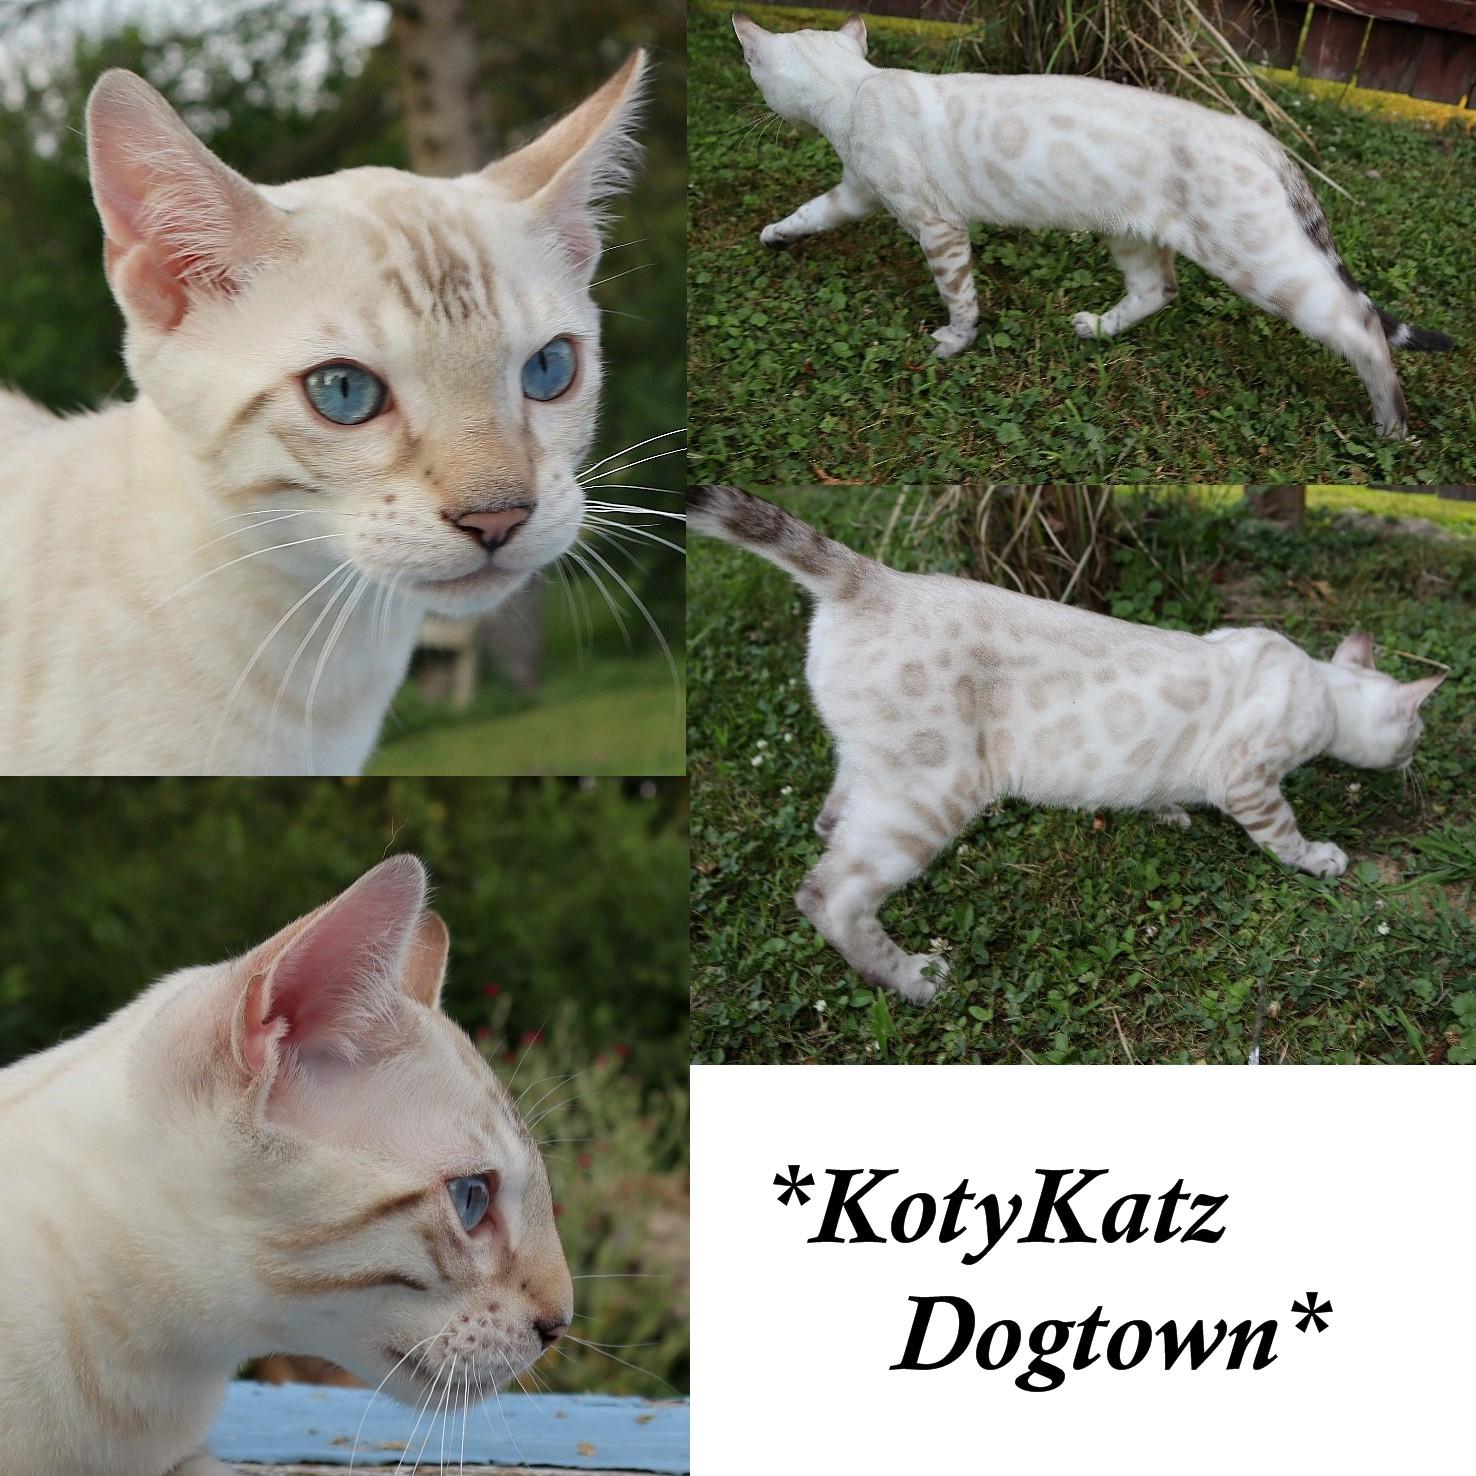 KotyKatz Dogtown 4 Months